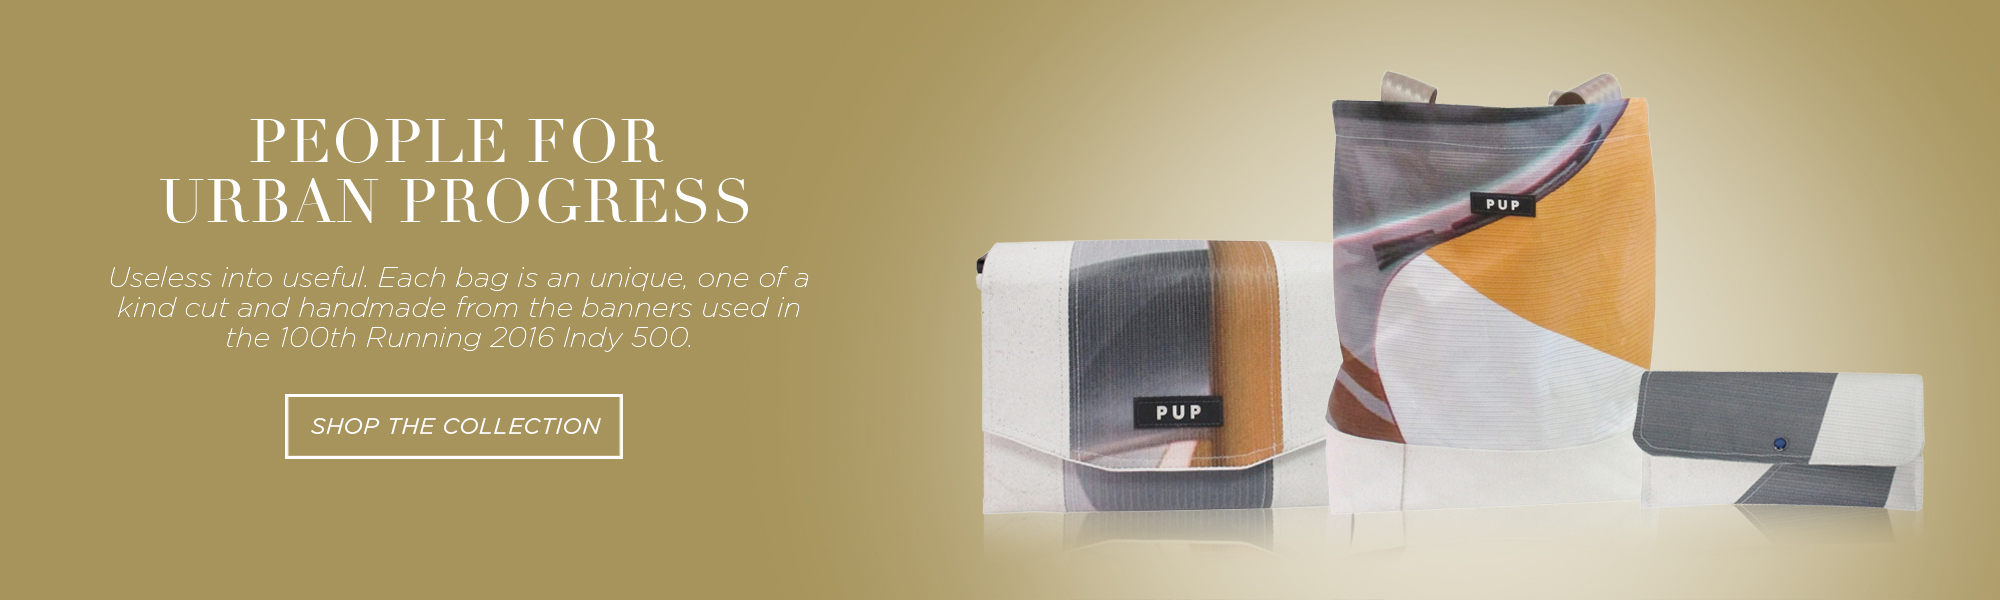 pup-handbags-2.jpg